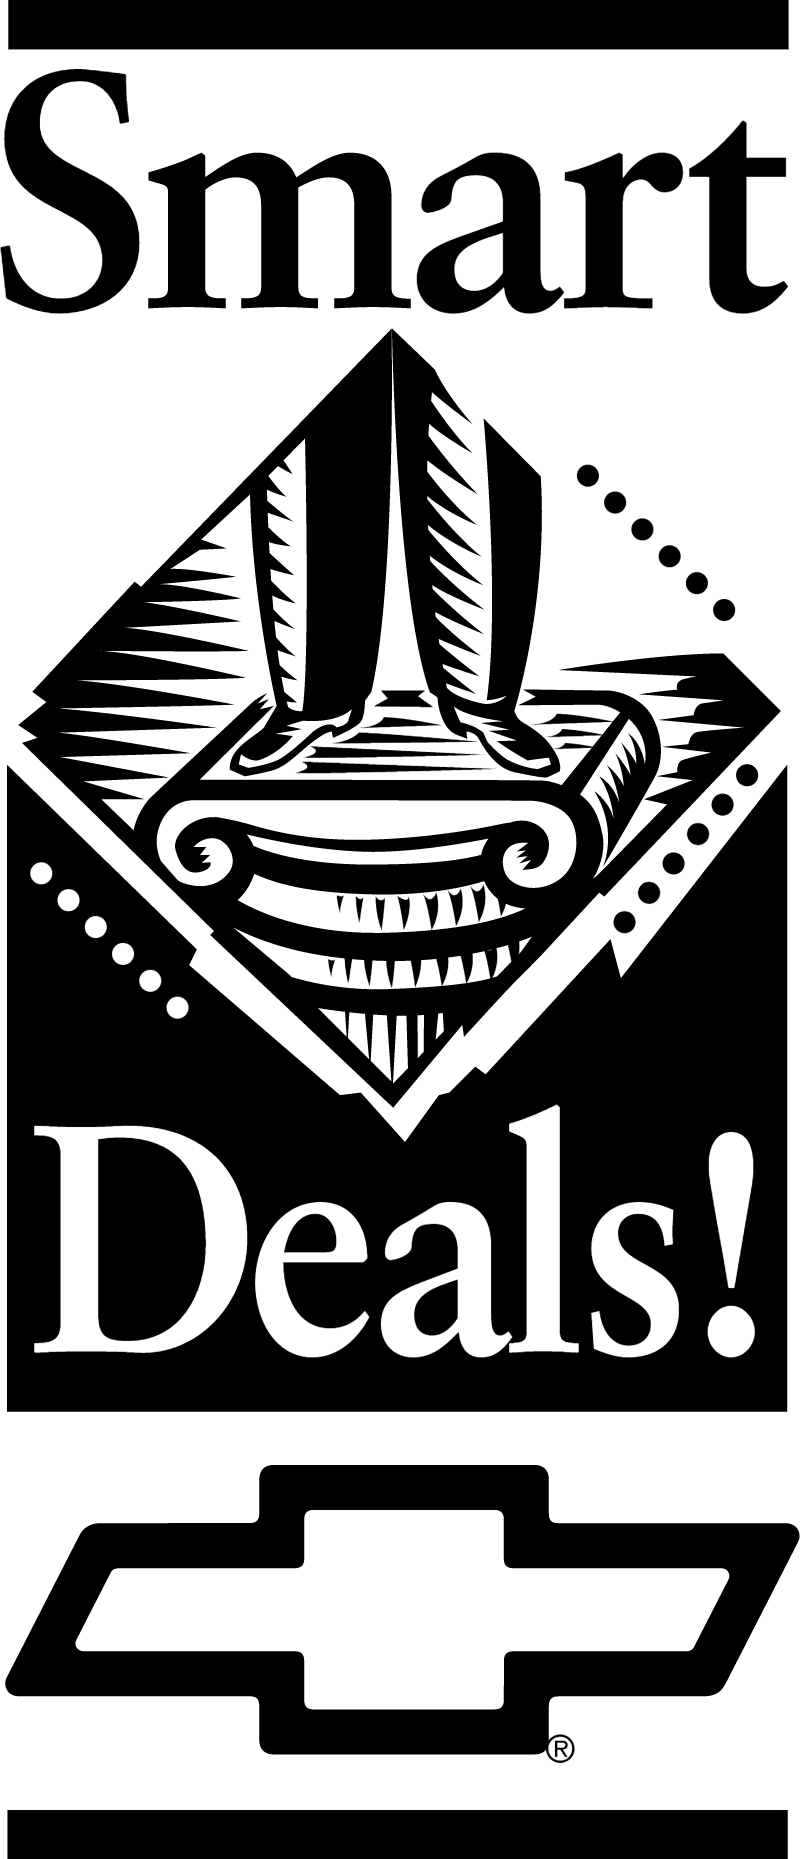 Chevrolet Smart Deals logo vector